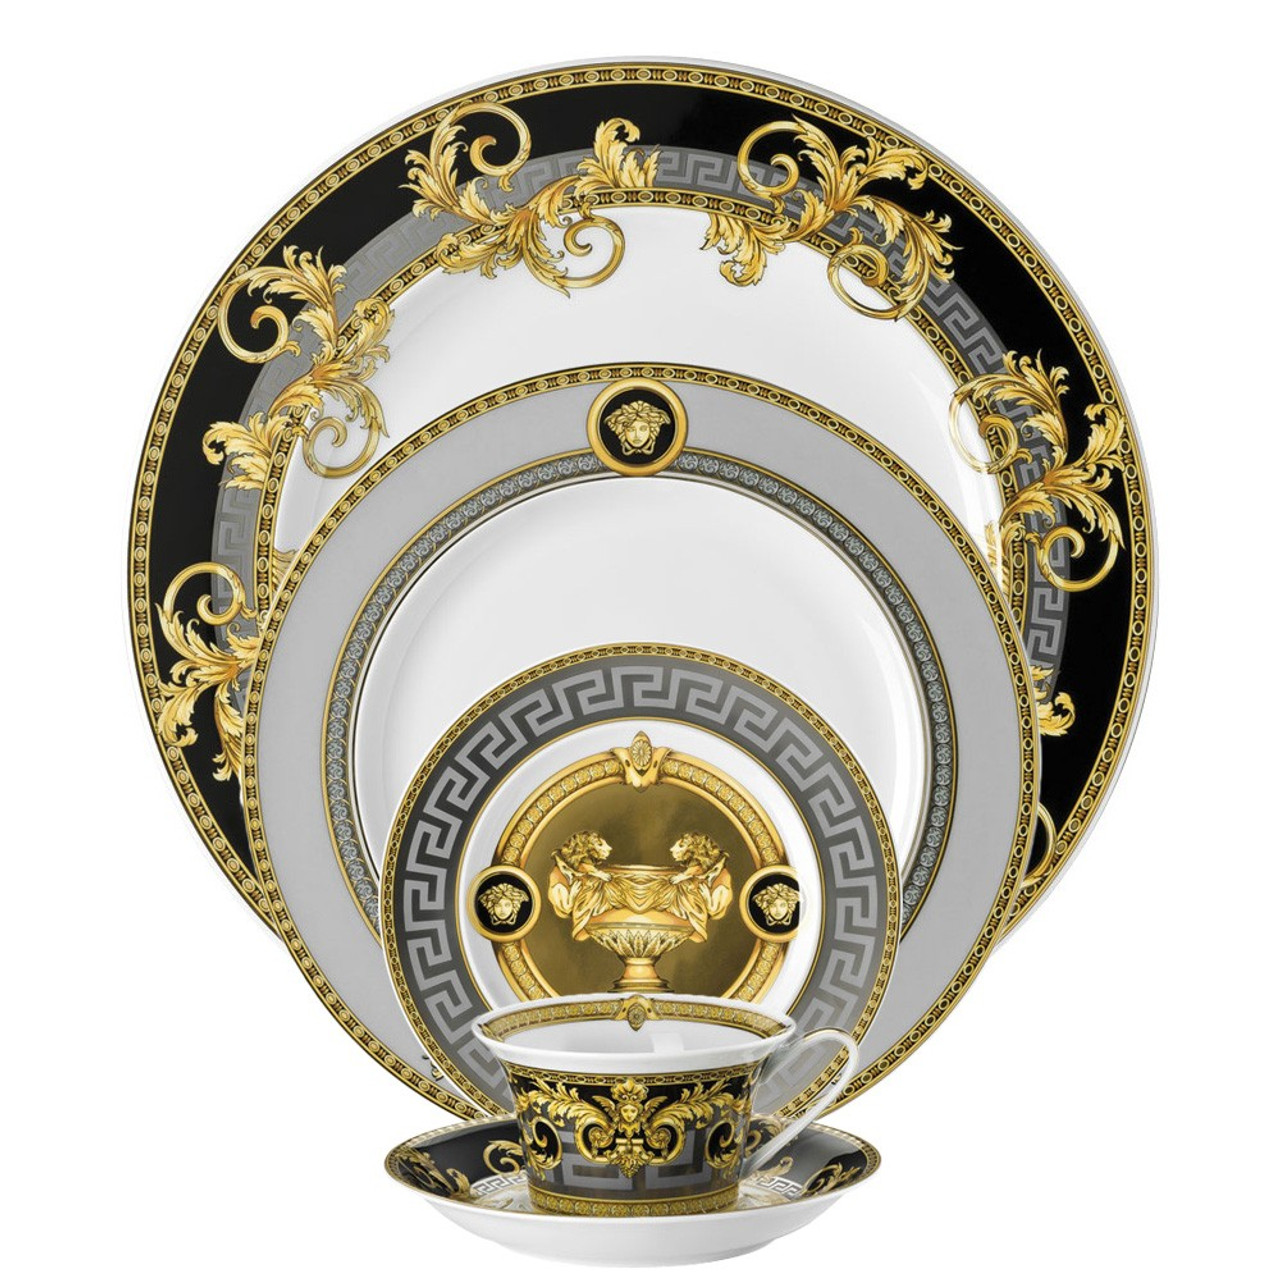 5 piece Dinnerware Set | Prestige Gala  sc 1 st  Rosenthal & 5 piece Dinnerware Set | Prestige Gala| Rosenthal Shop